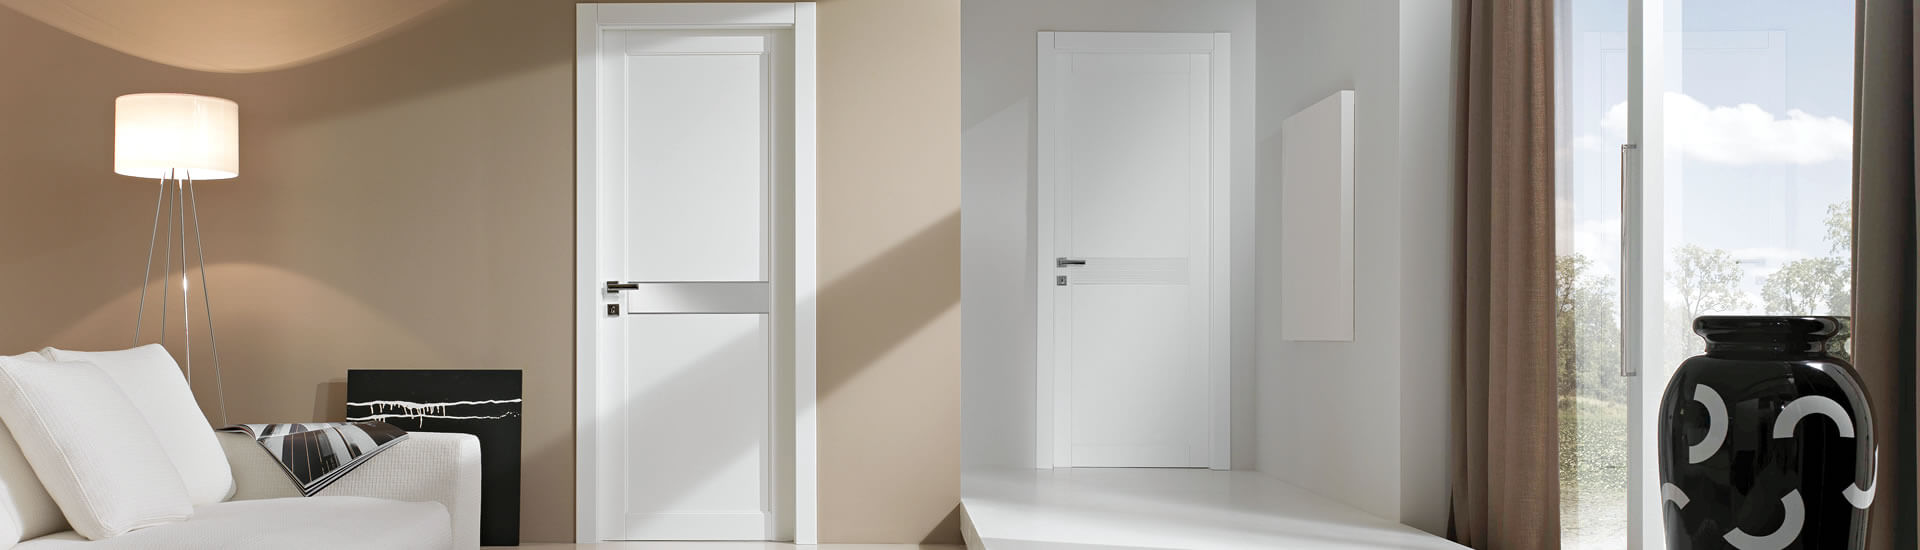 Интериорни врати от DOOR matic София